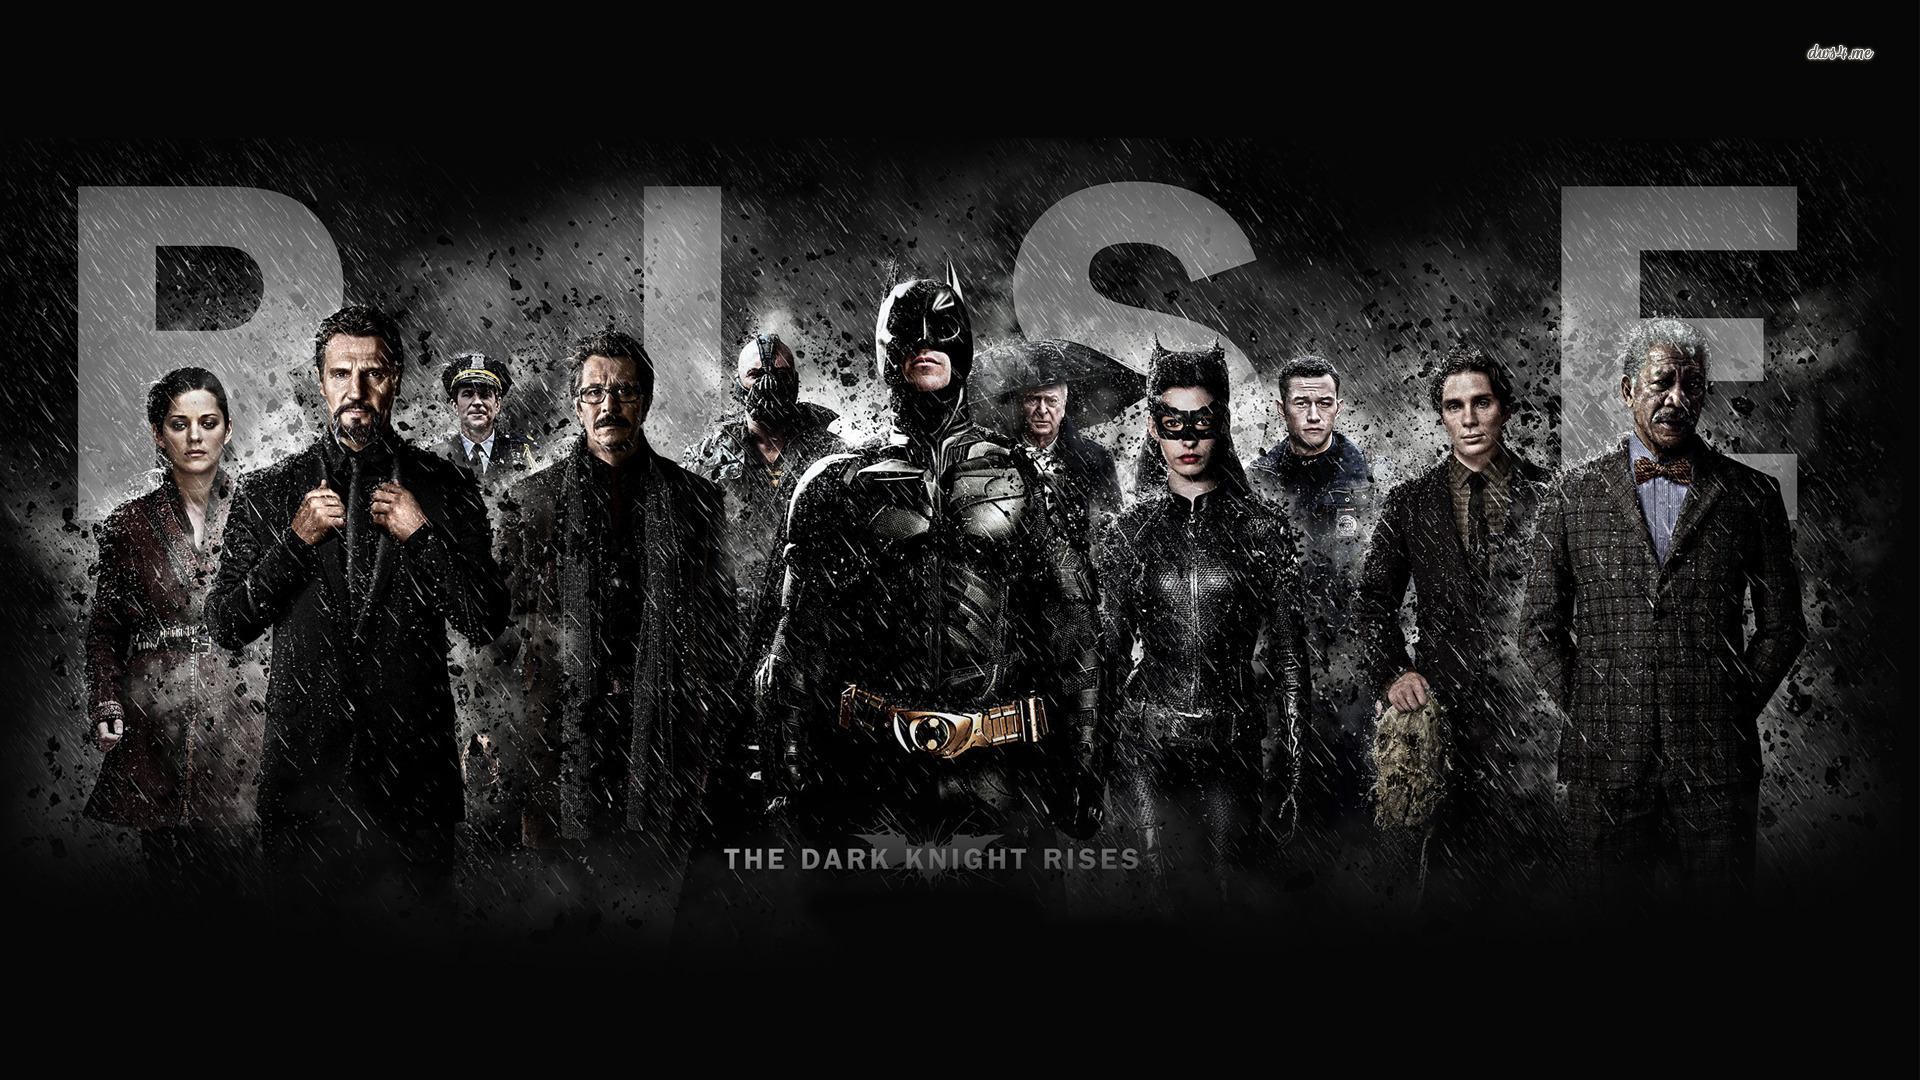 4269-the-dark-knight-rises-1920x1080-movie-wallpaper